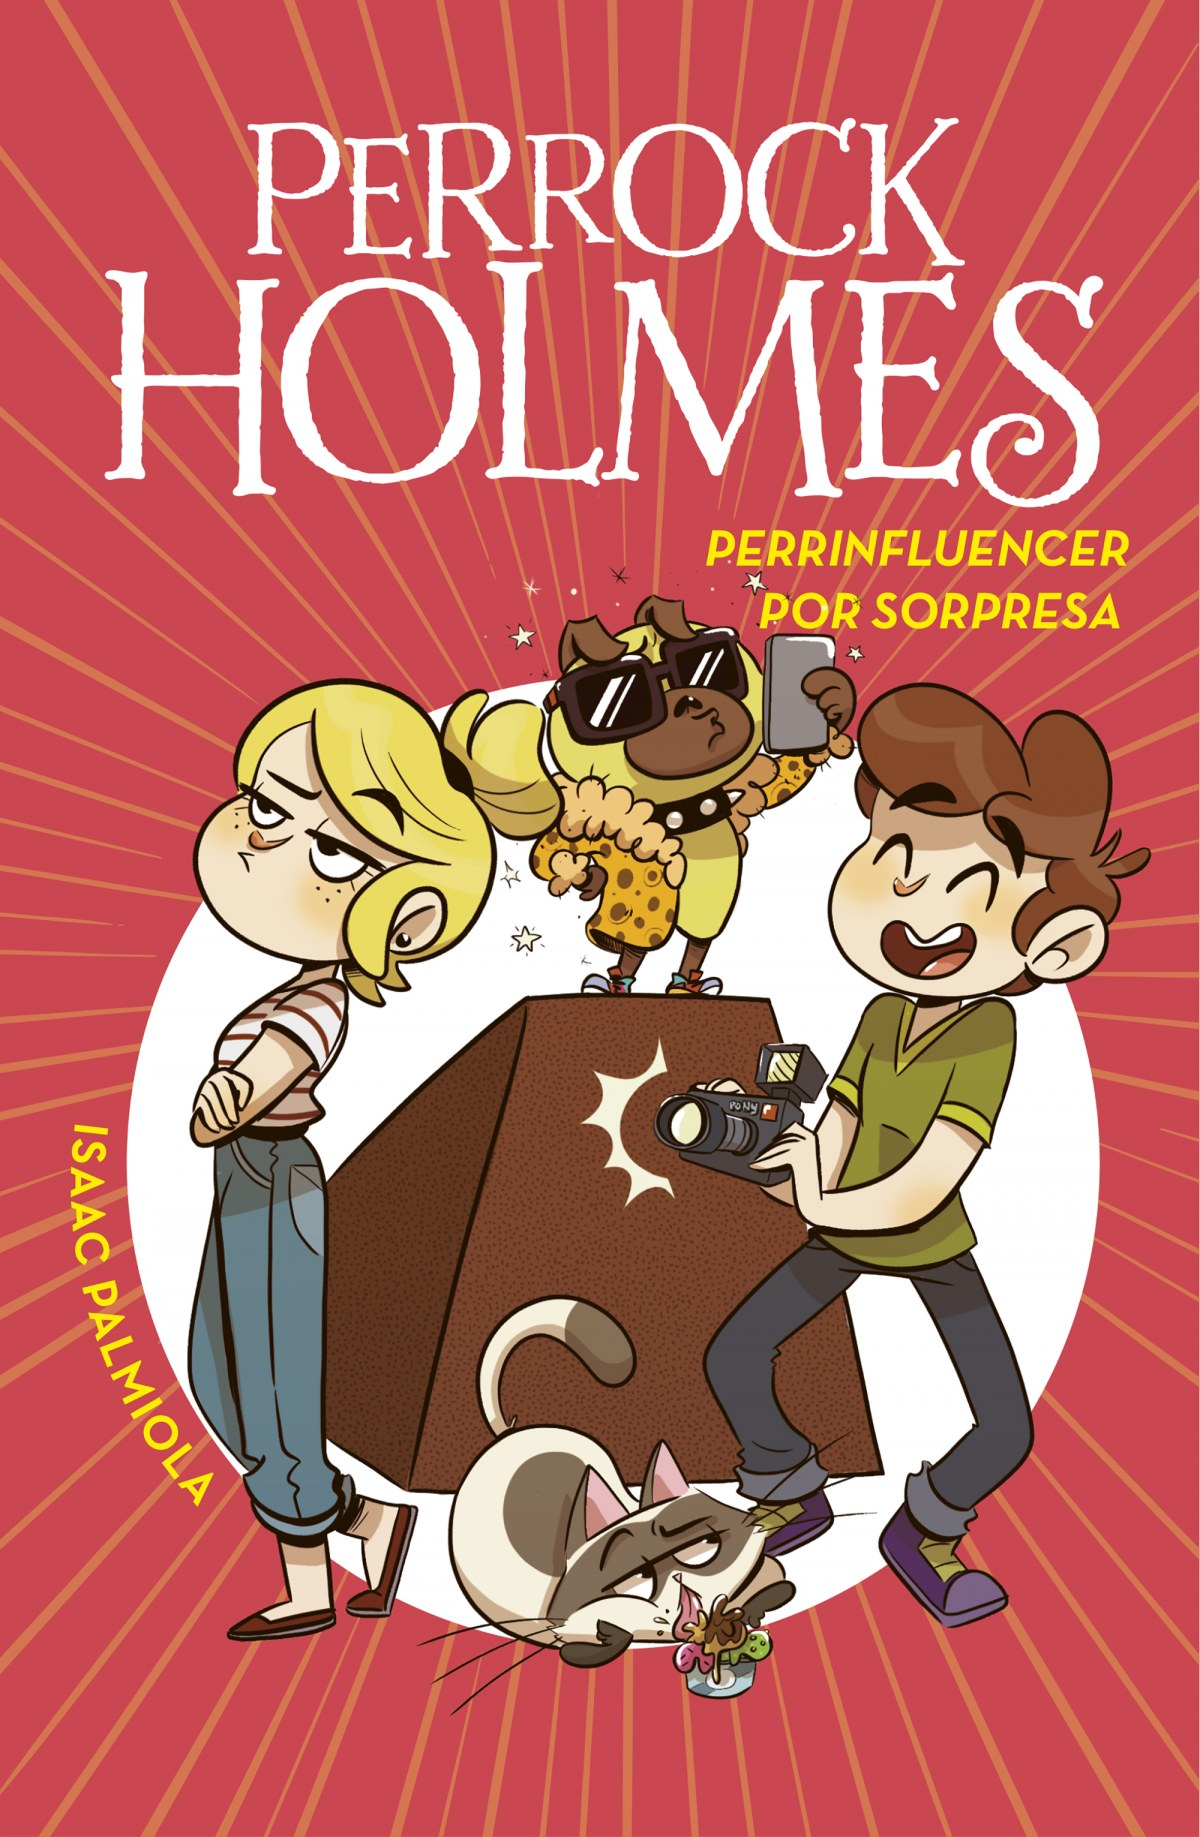 Perrinfluencer por sorpresa (Serie Perrock Holmes 15) 9788418038730